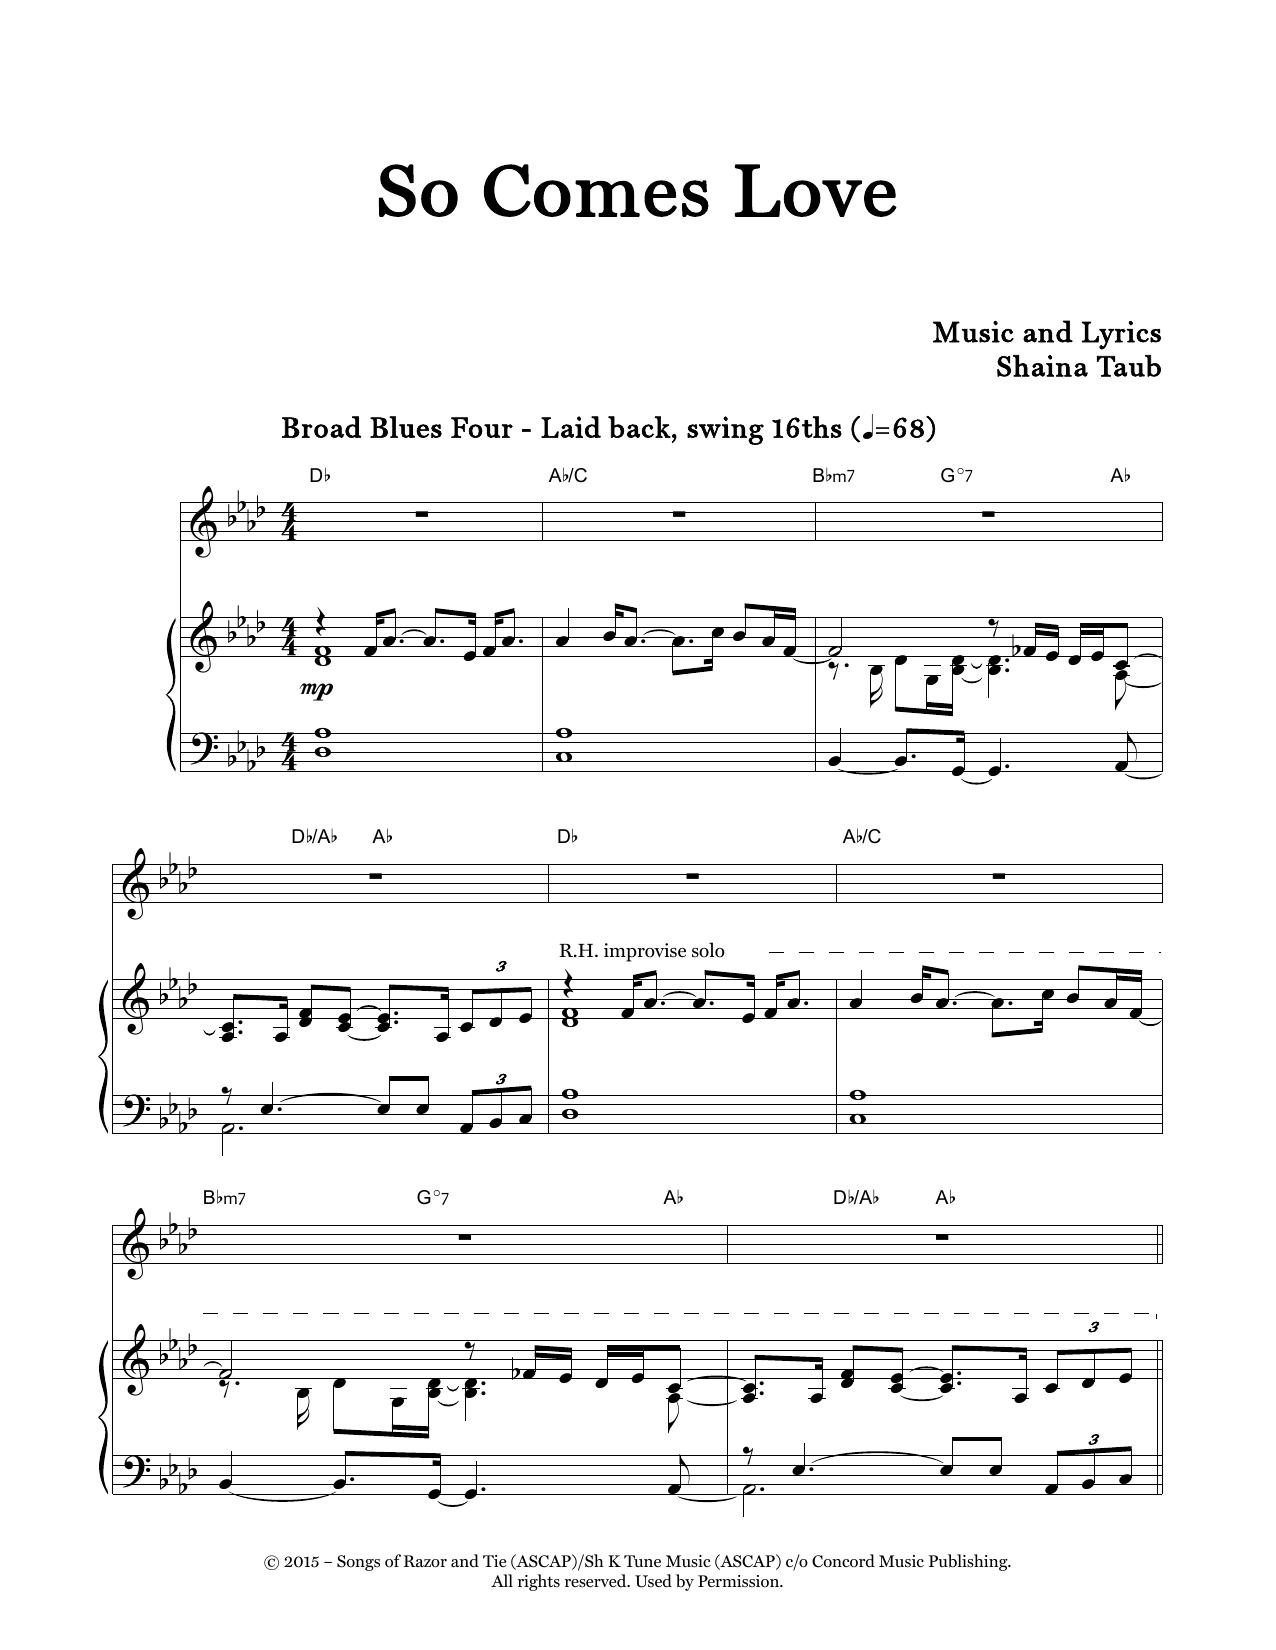 So Comes Love Sheet Music